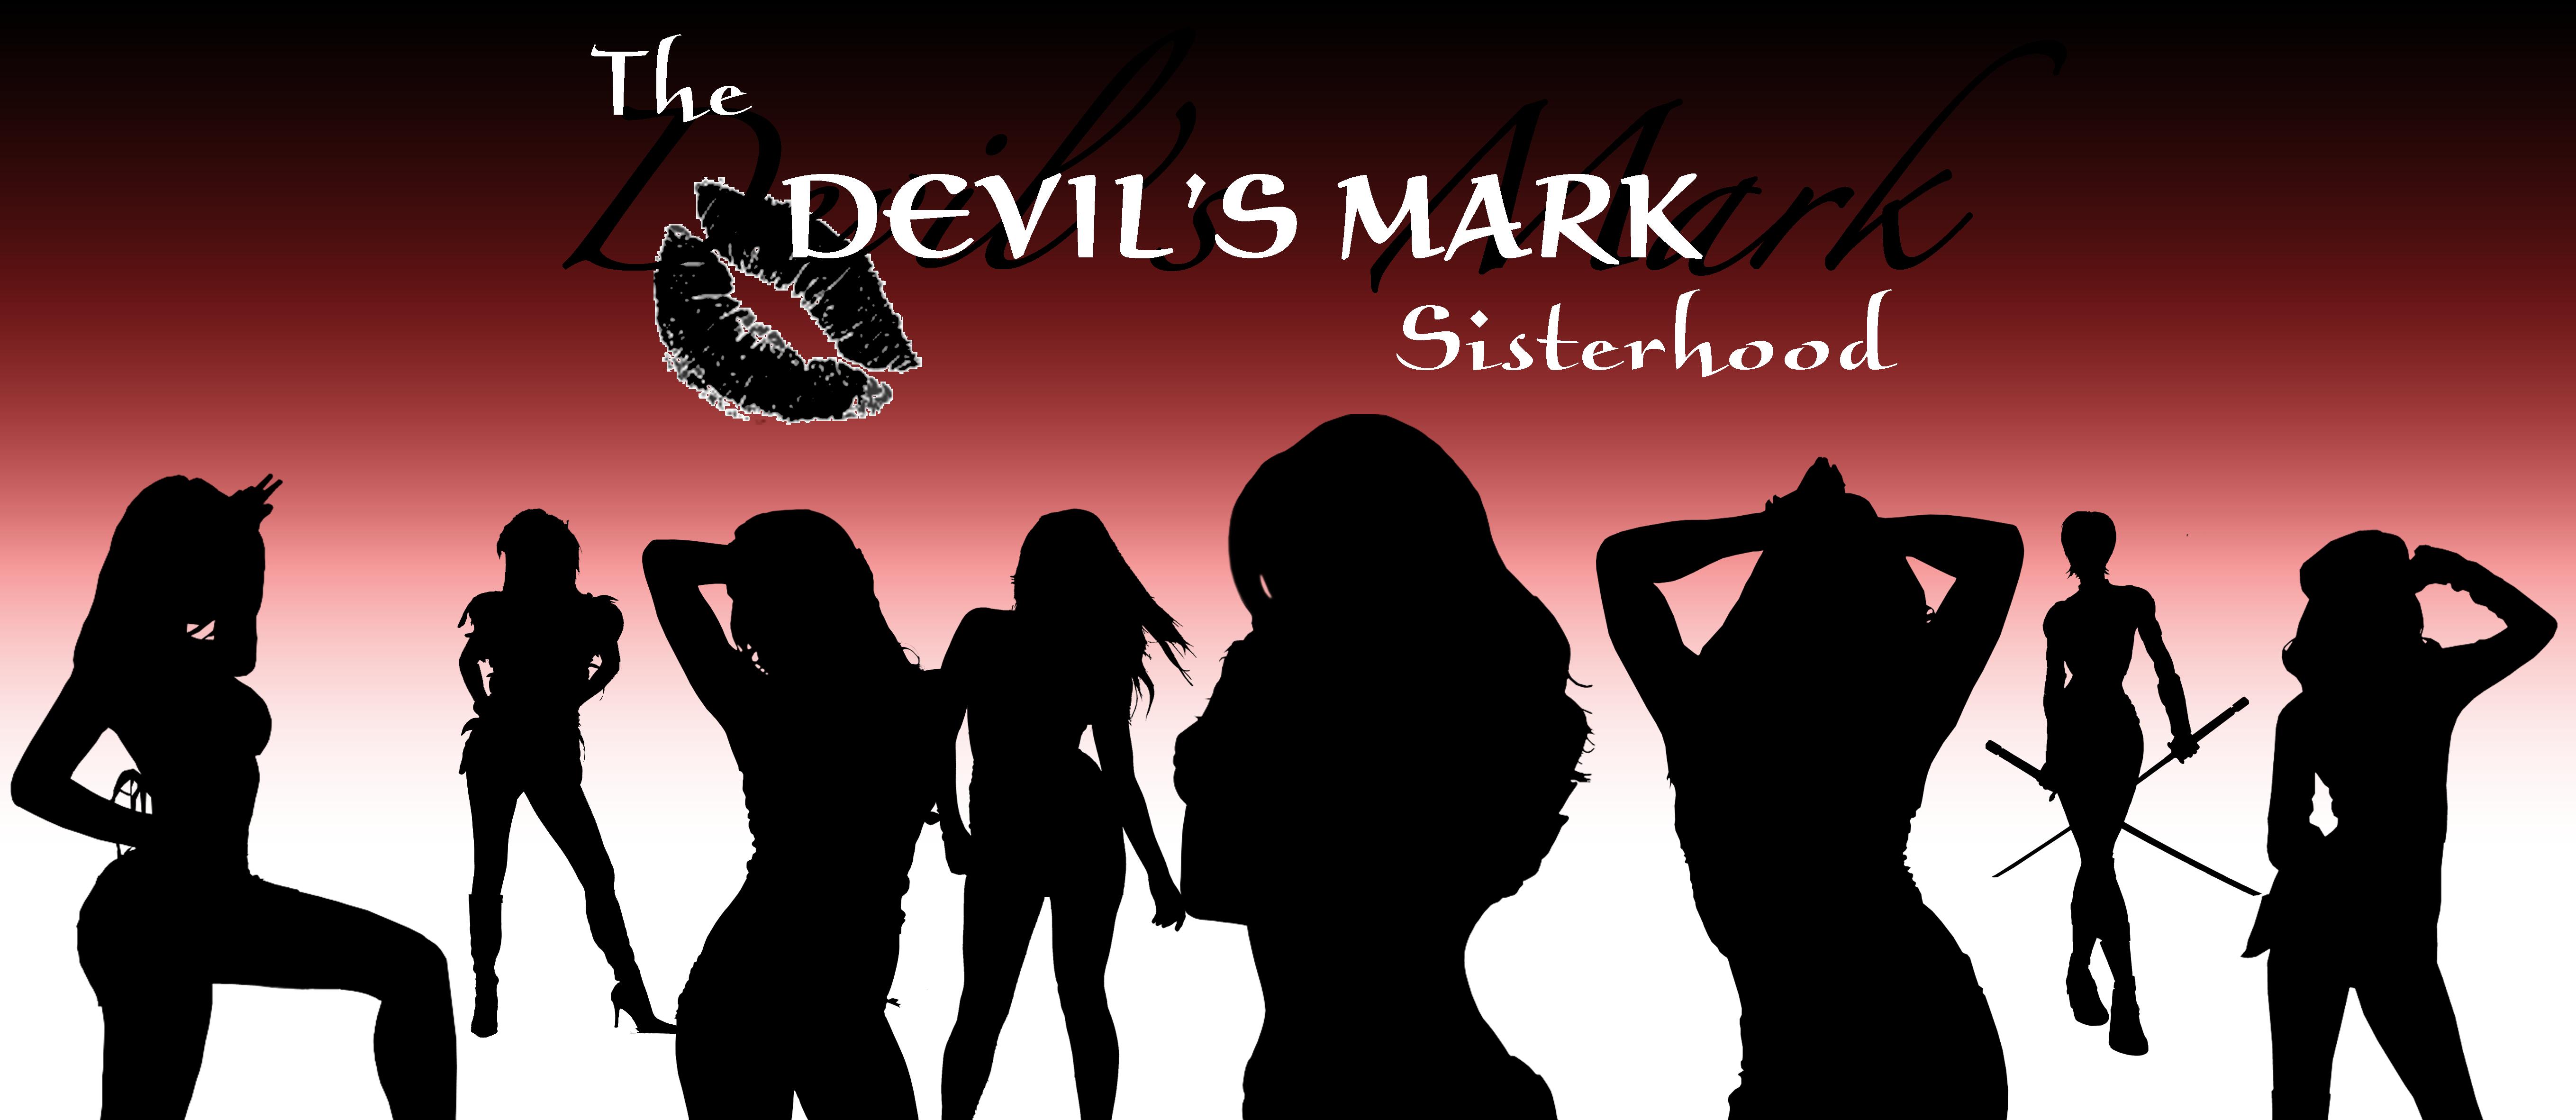 1650162-the_devil_s_mark_sisterhood